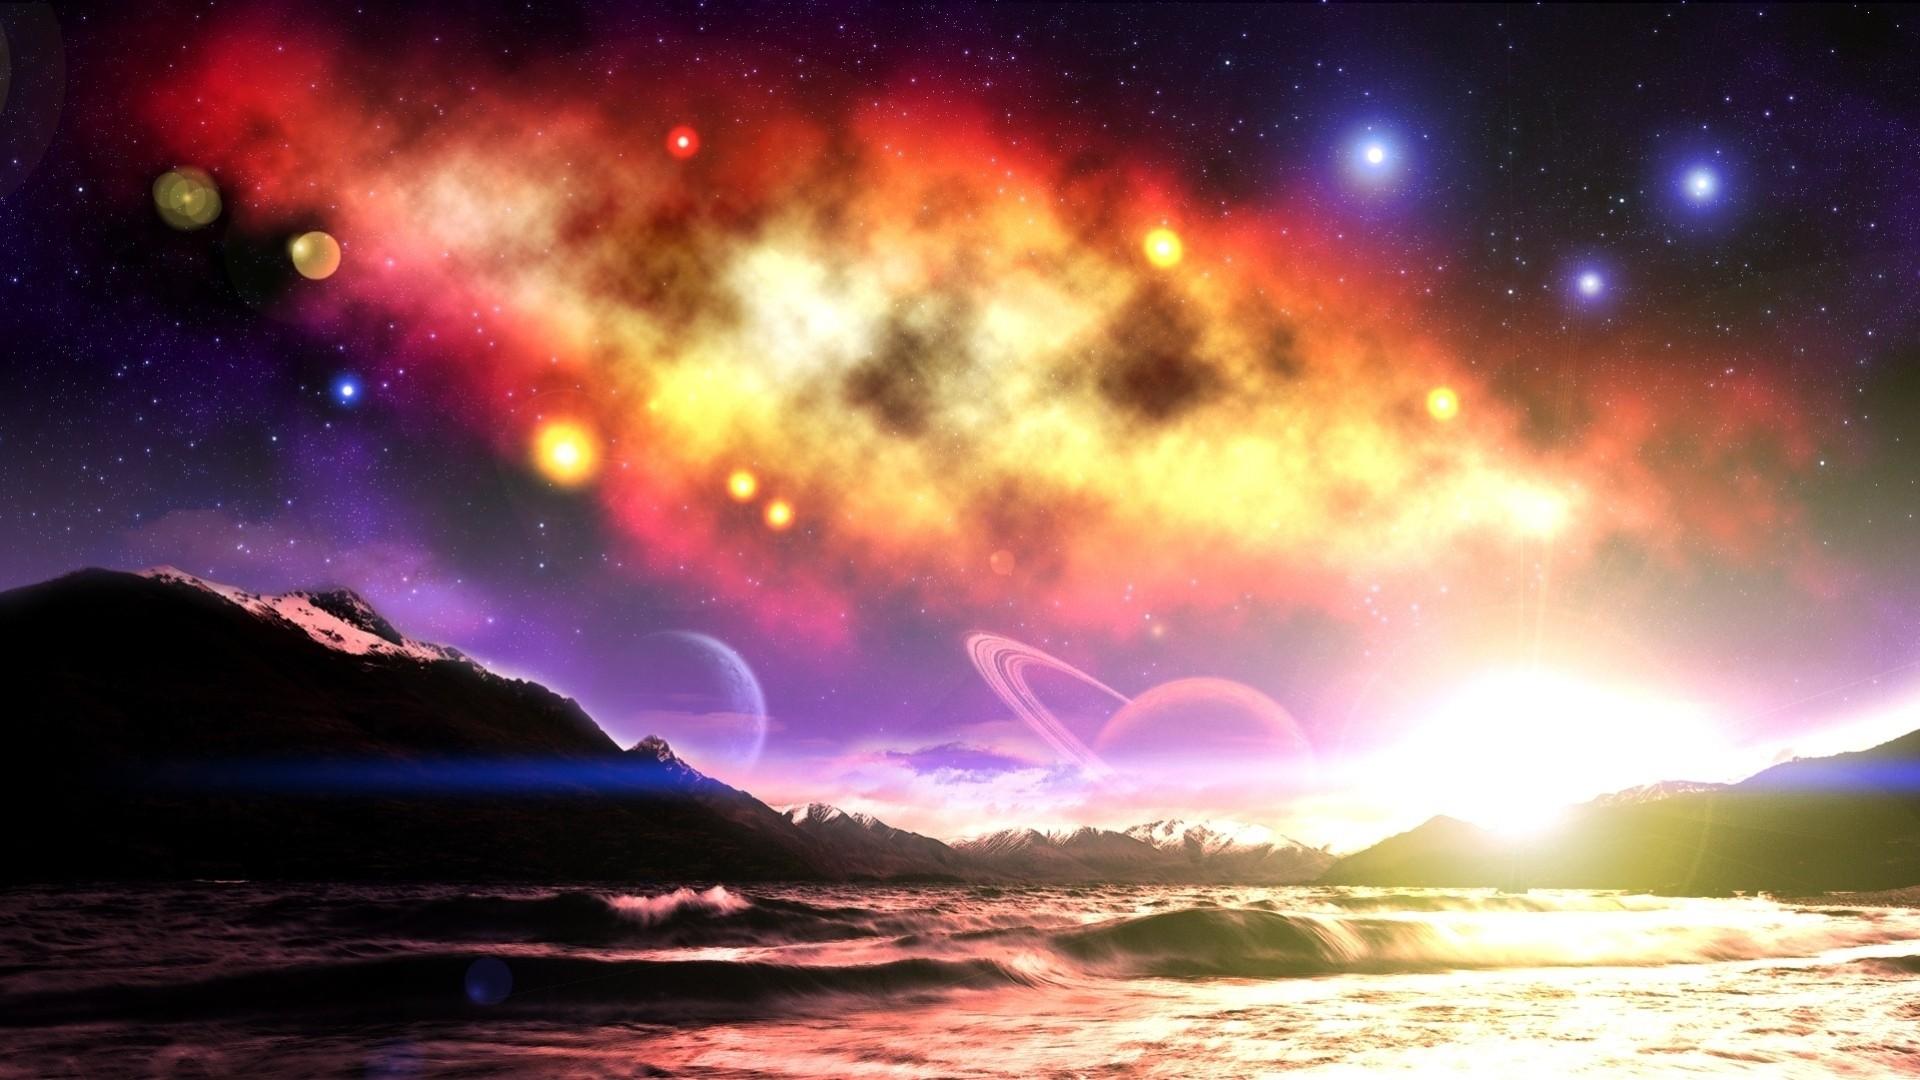 Celestial Pic